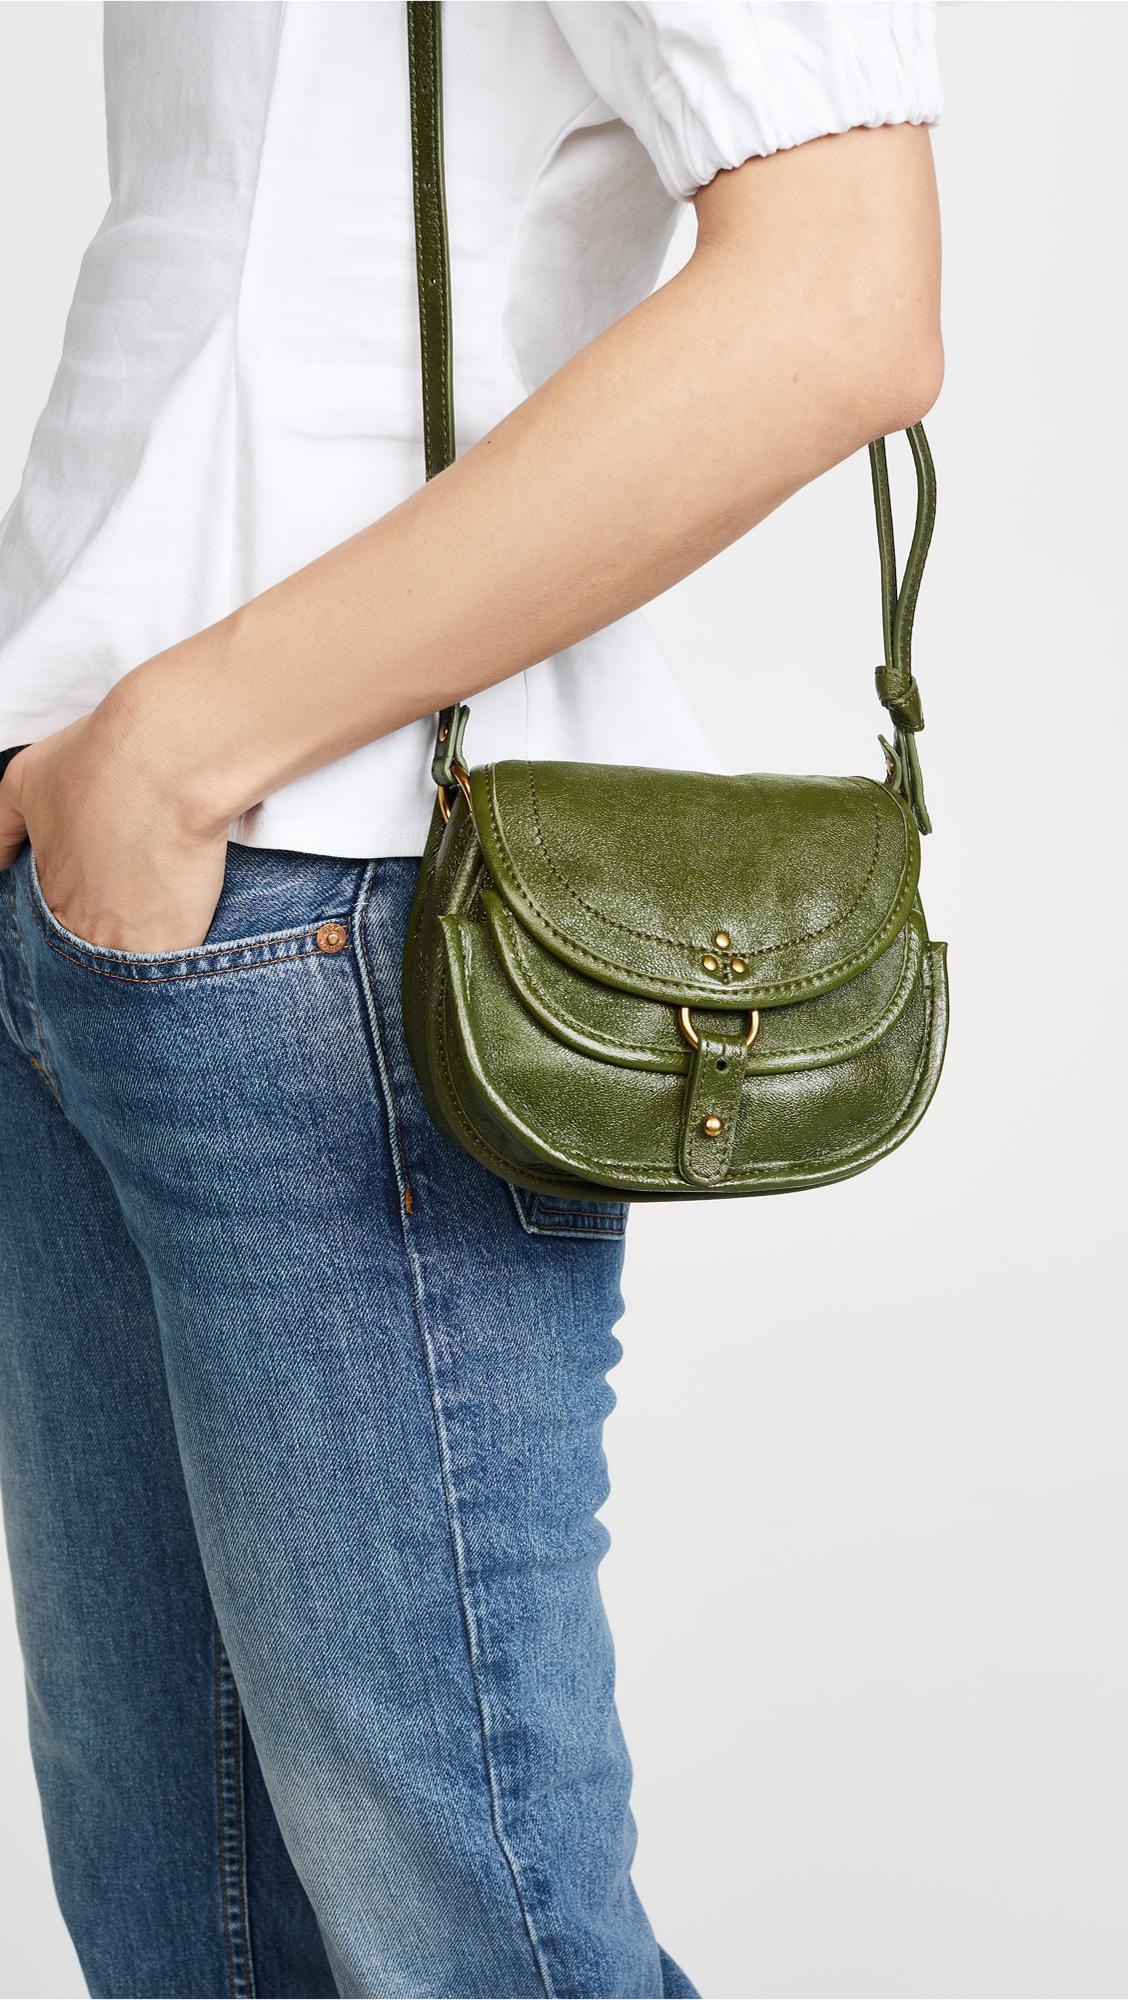 Jérôme Dreyfuss Leather Mini Felix Cross Body Bag in Green